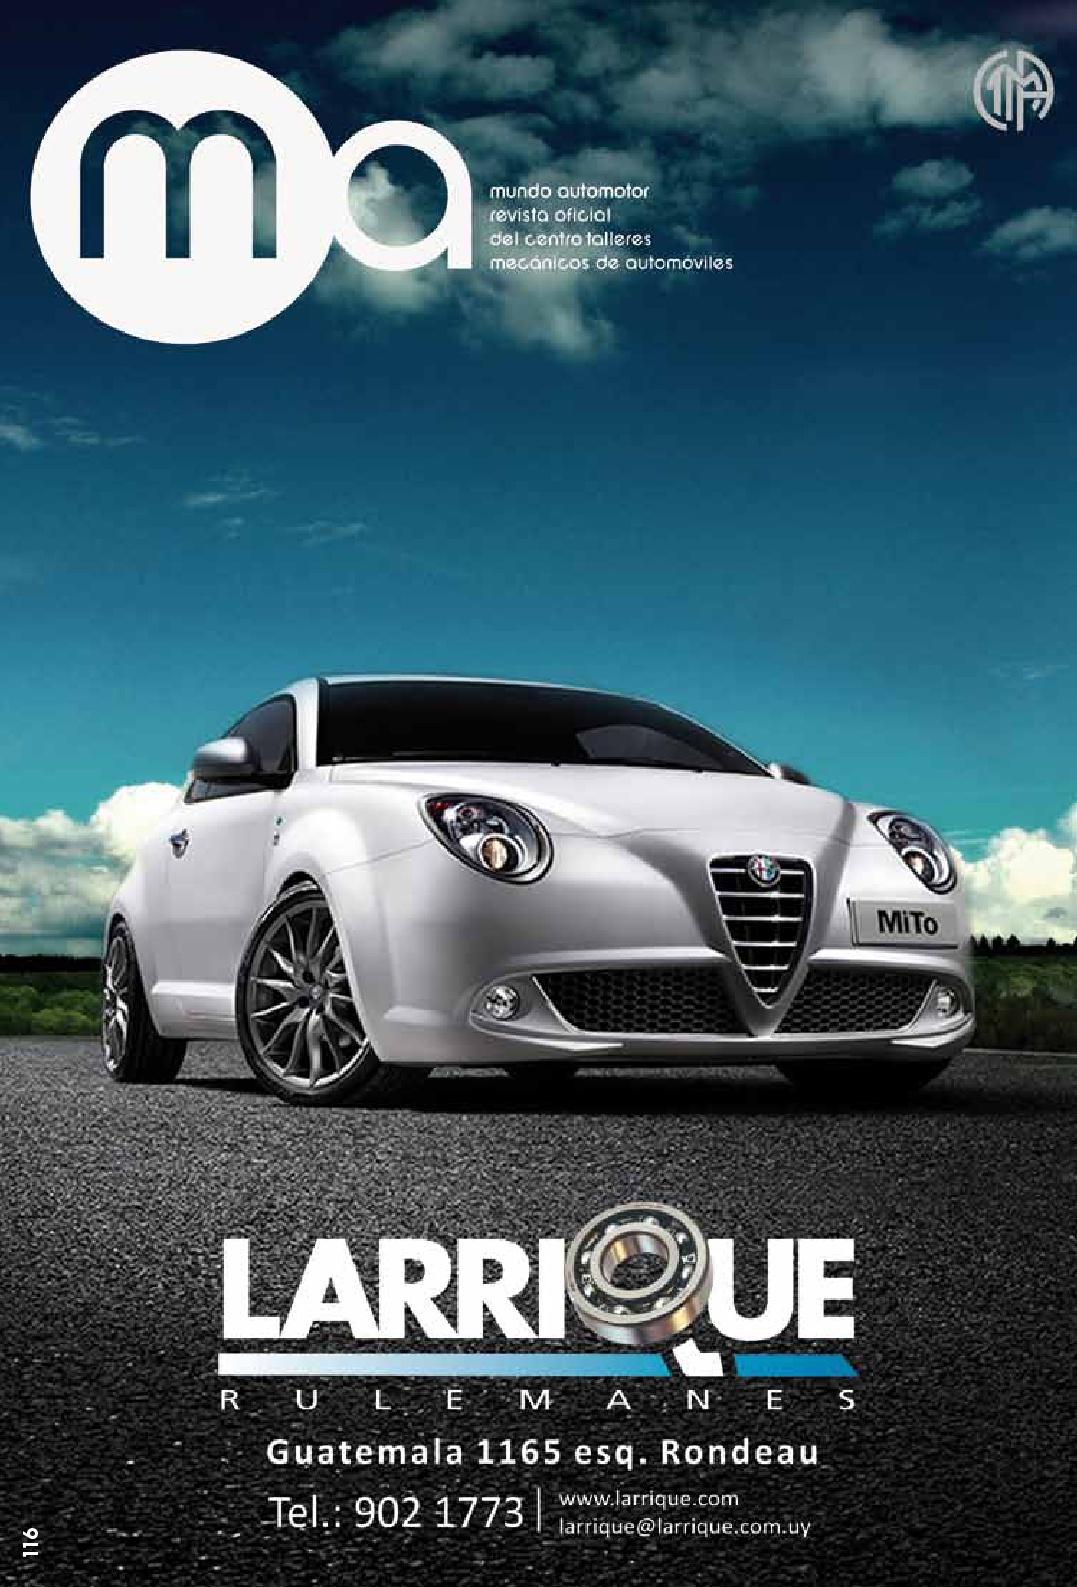 mundo_automotor_116-001